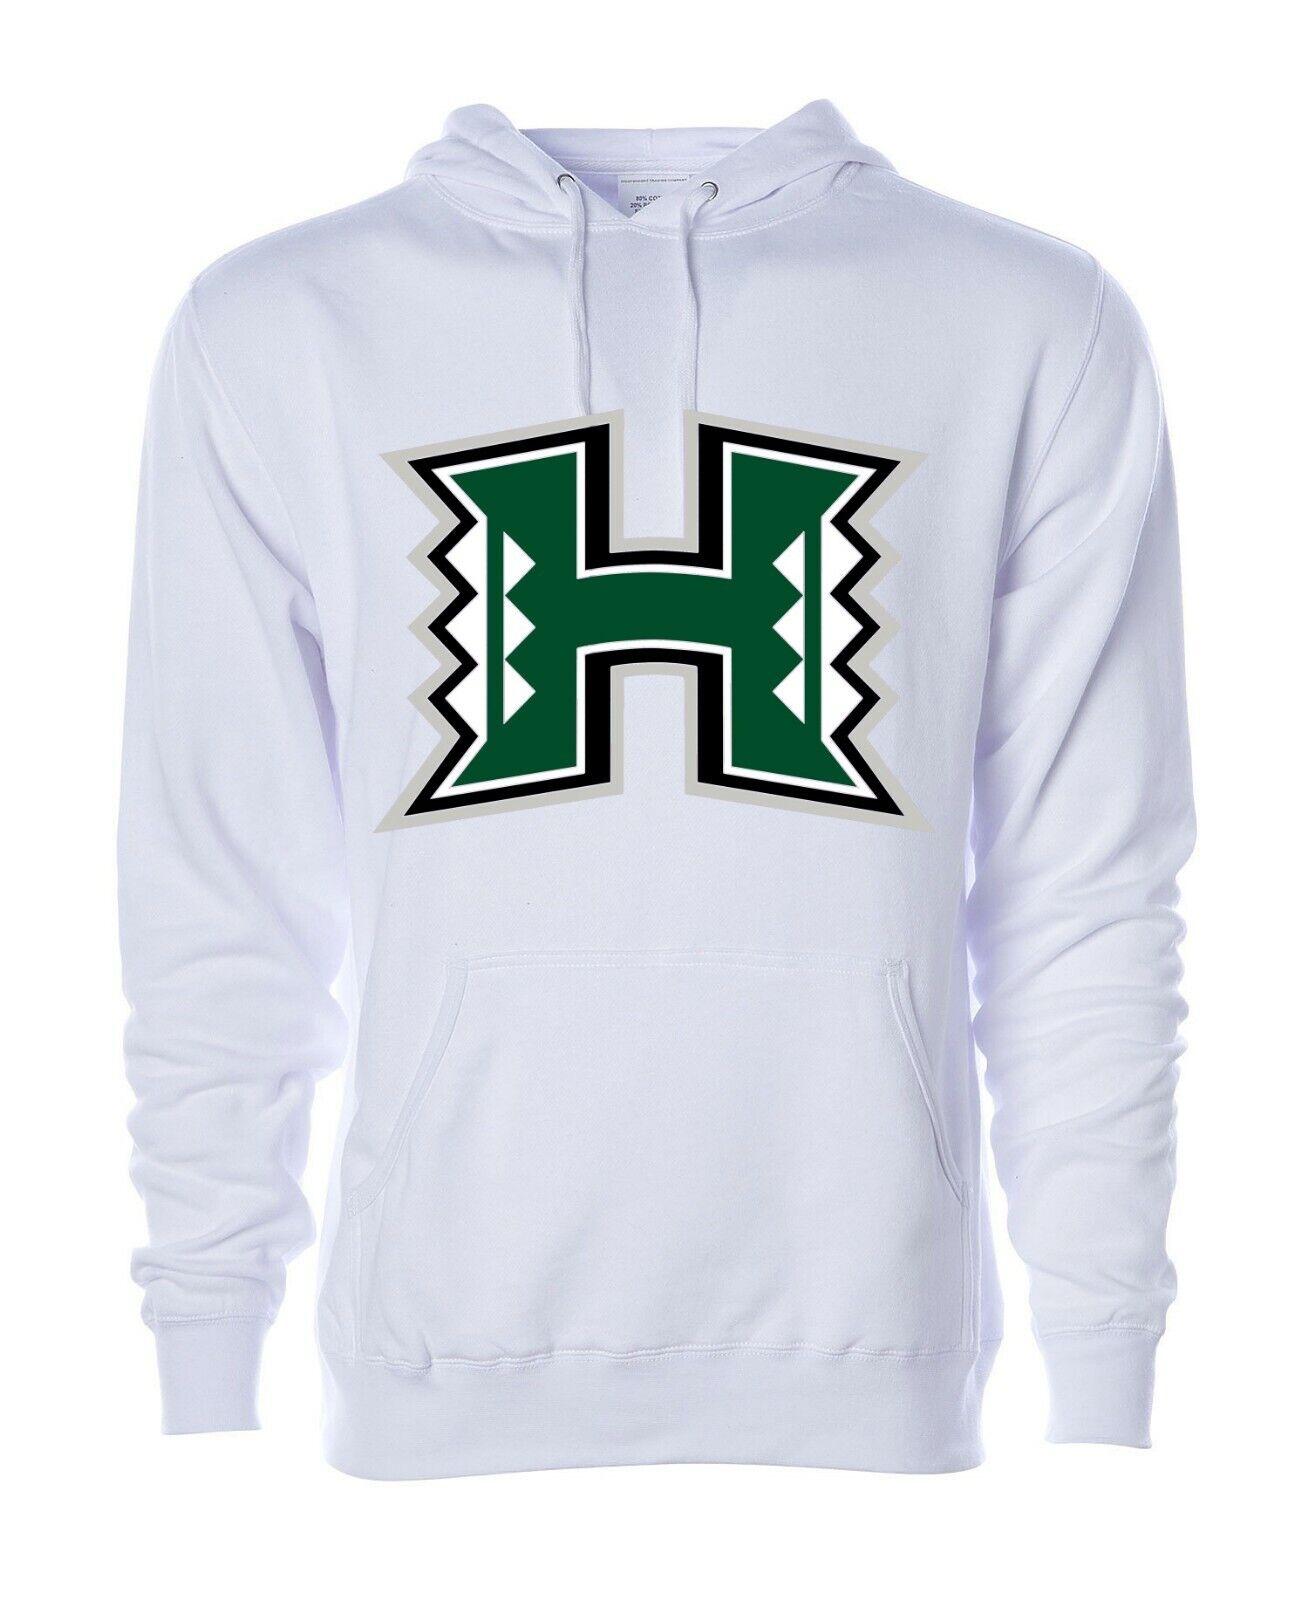 University Of Hawaii Rainbow Warriors NCAA Hoodie College Sweatshirt S M L XL2XL